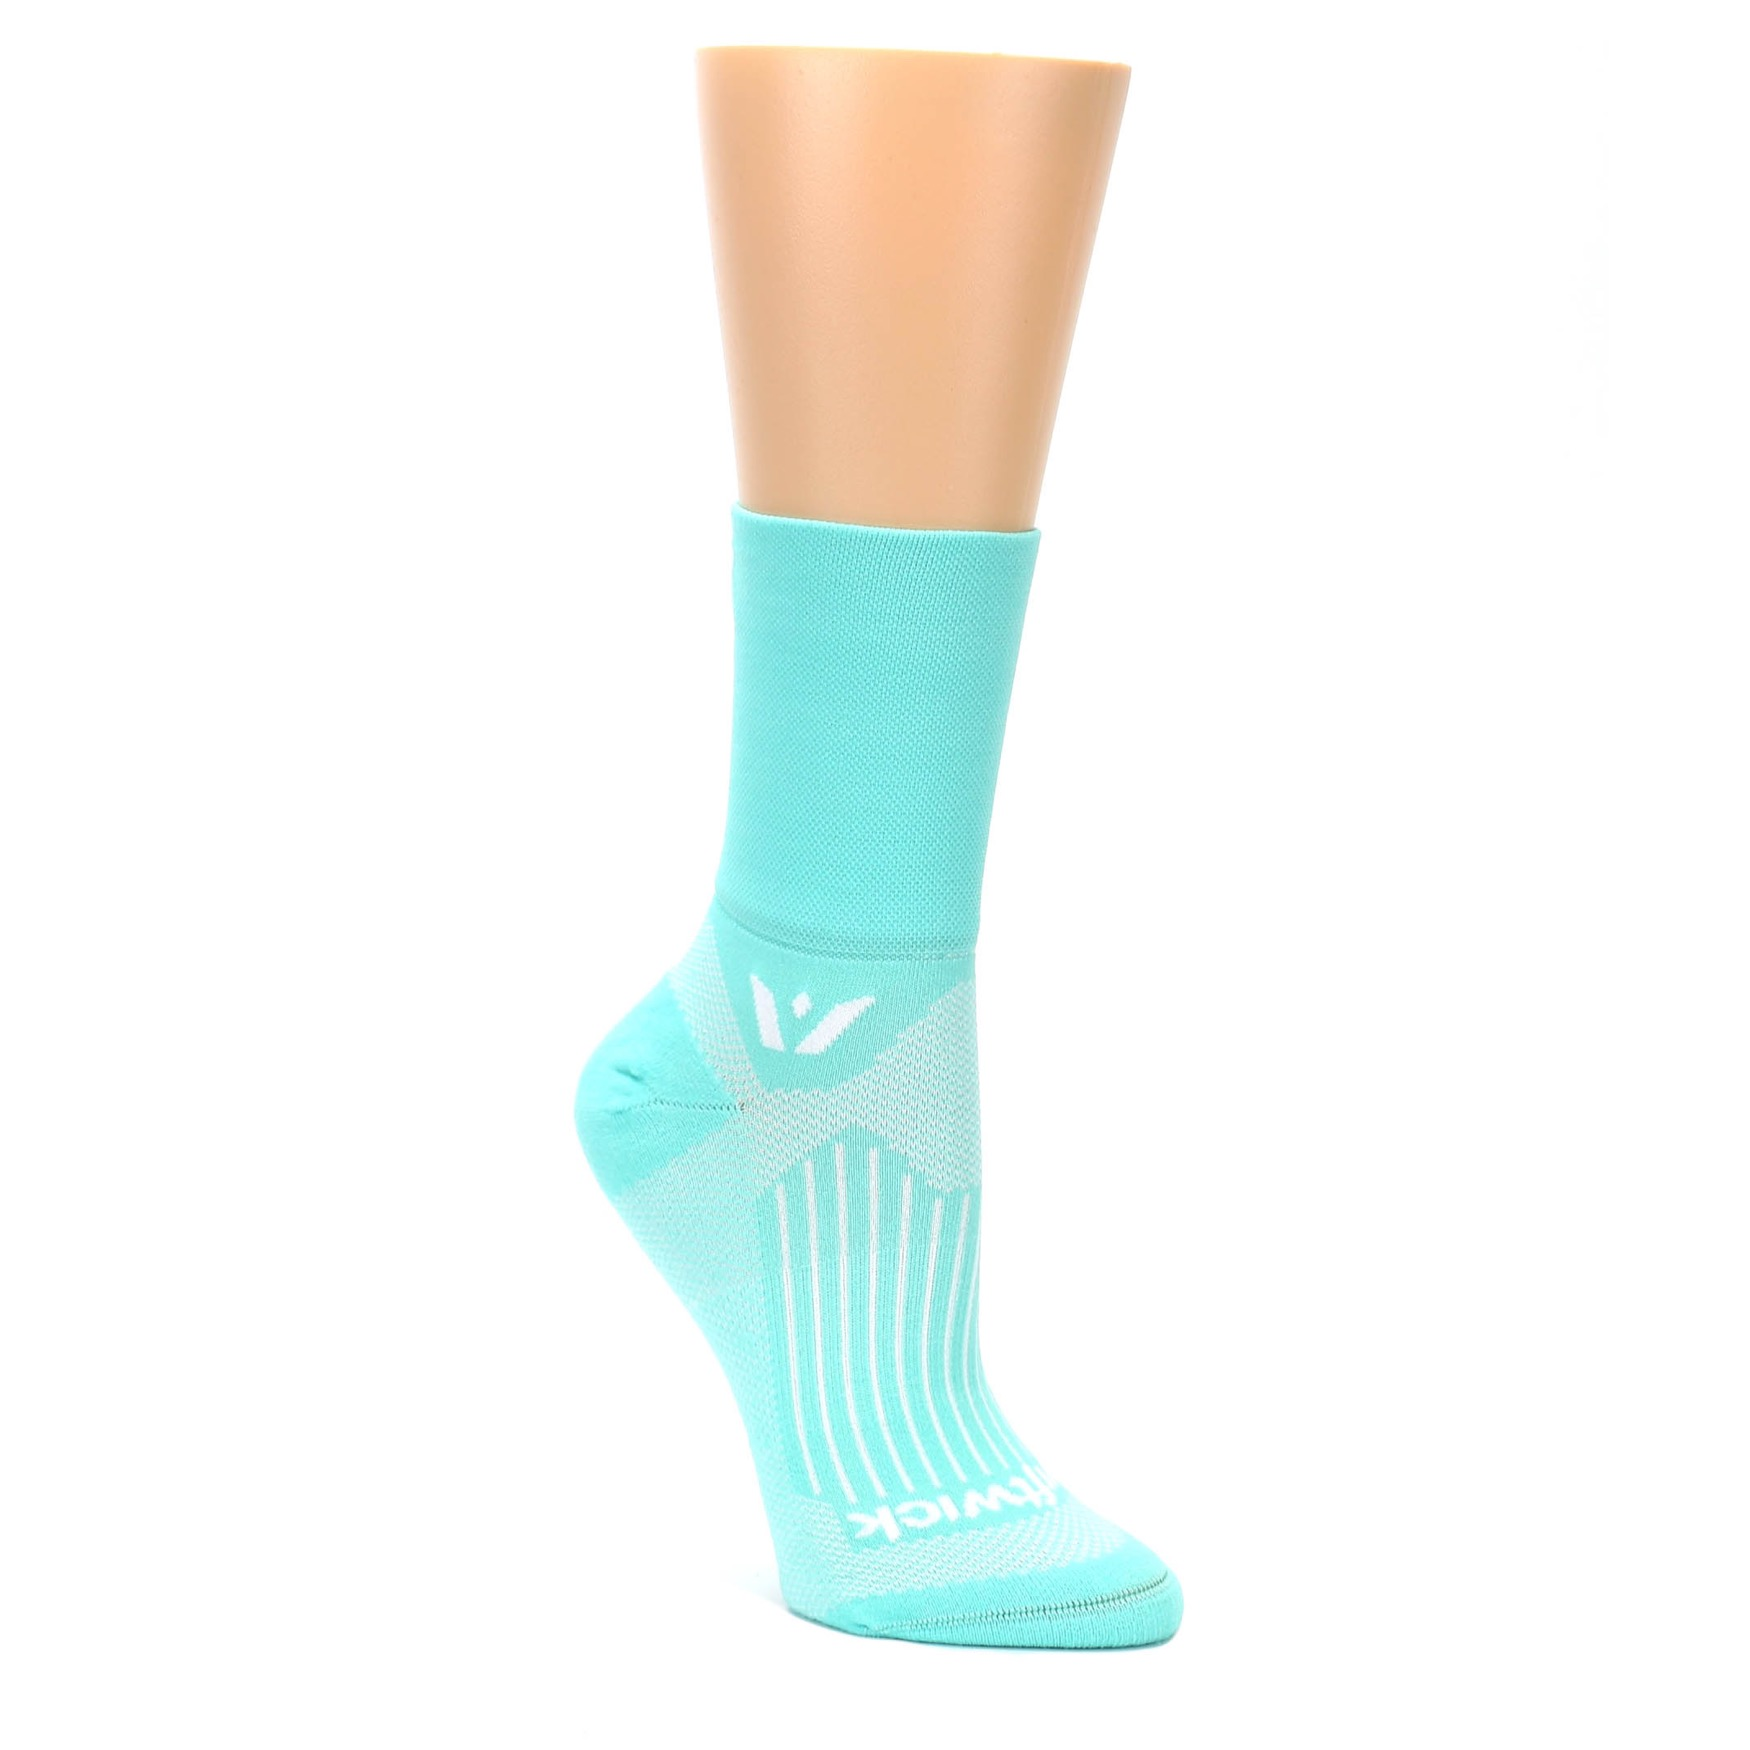 Mint Solid Color Socks - Women's Crew Athletic Socks | boldSOCKS